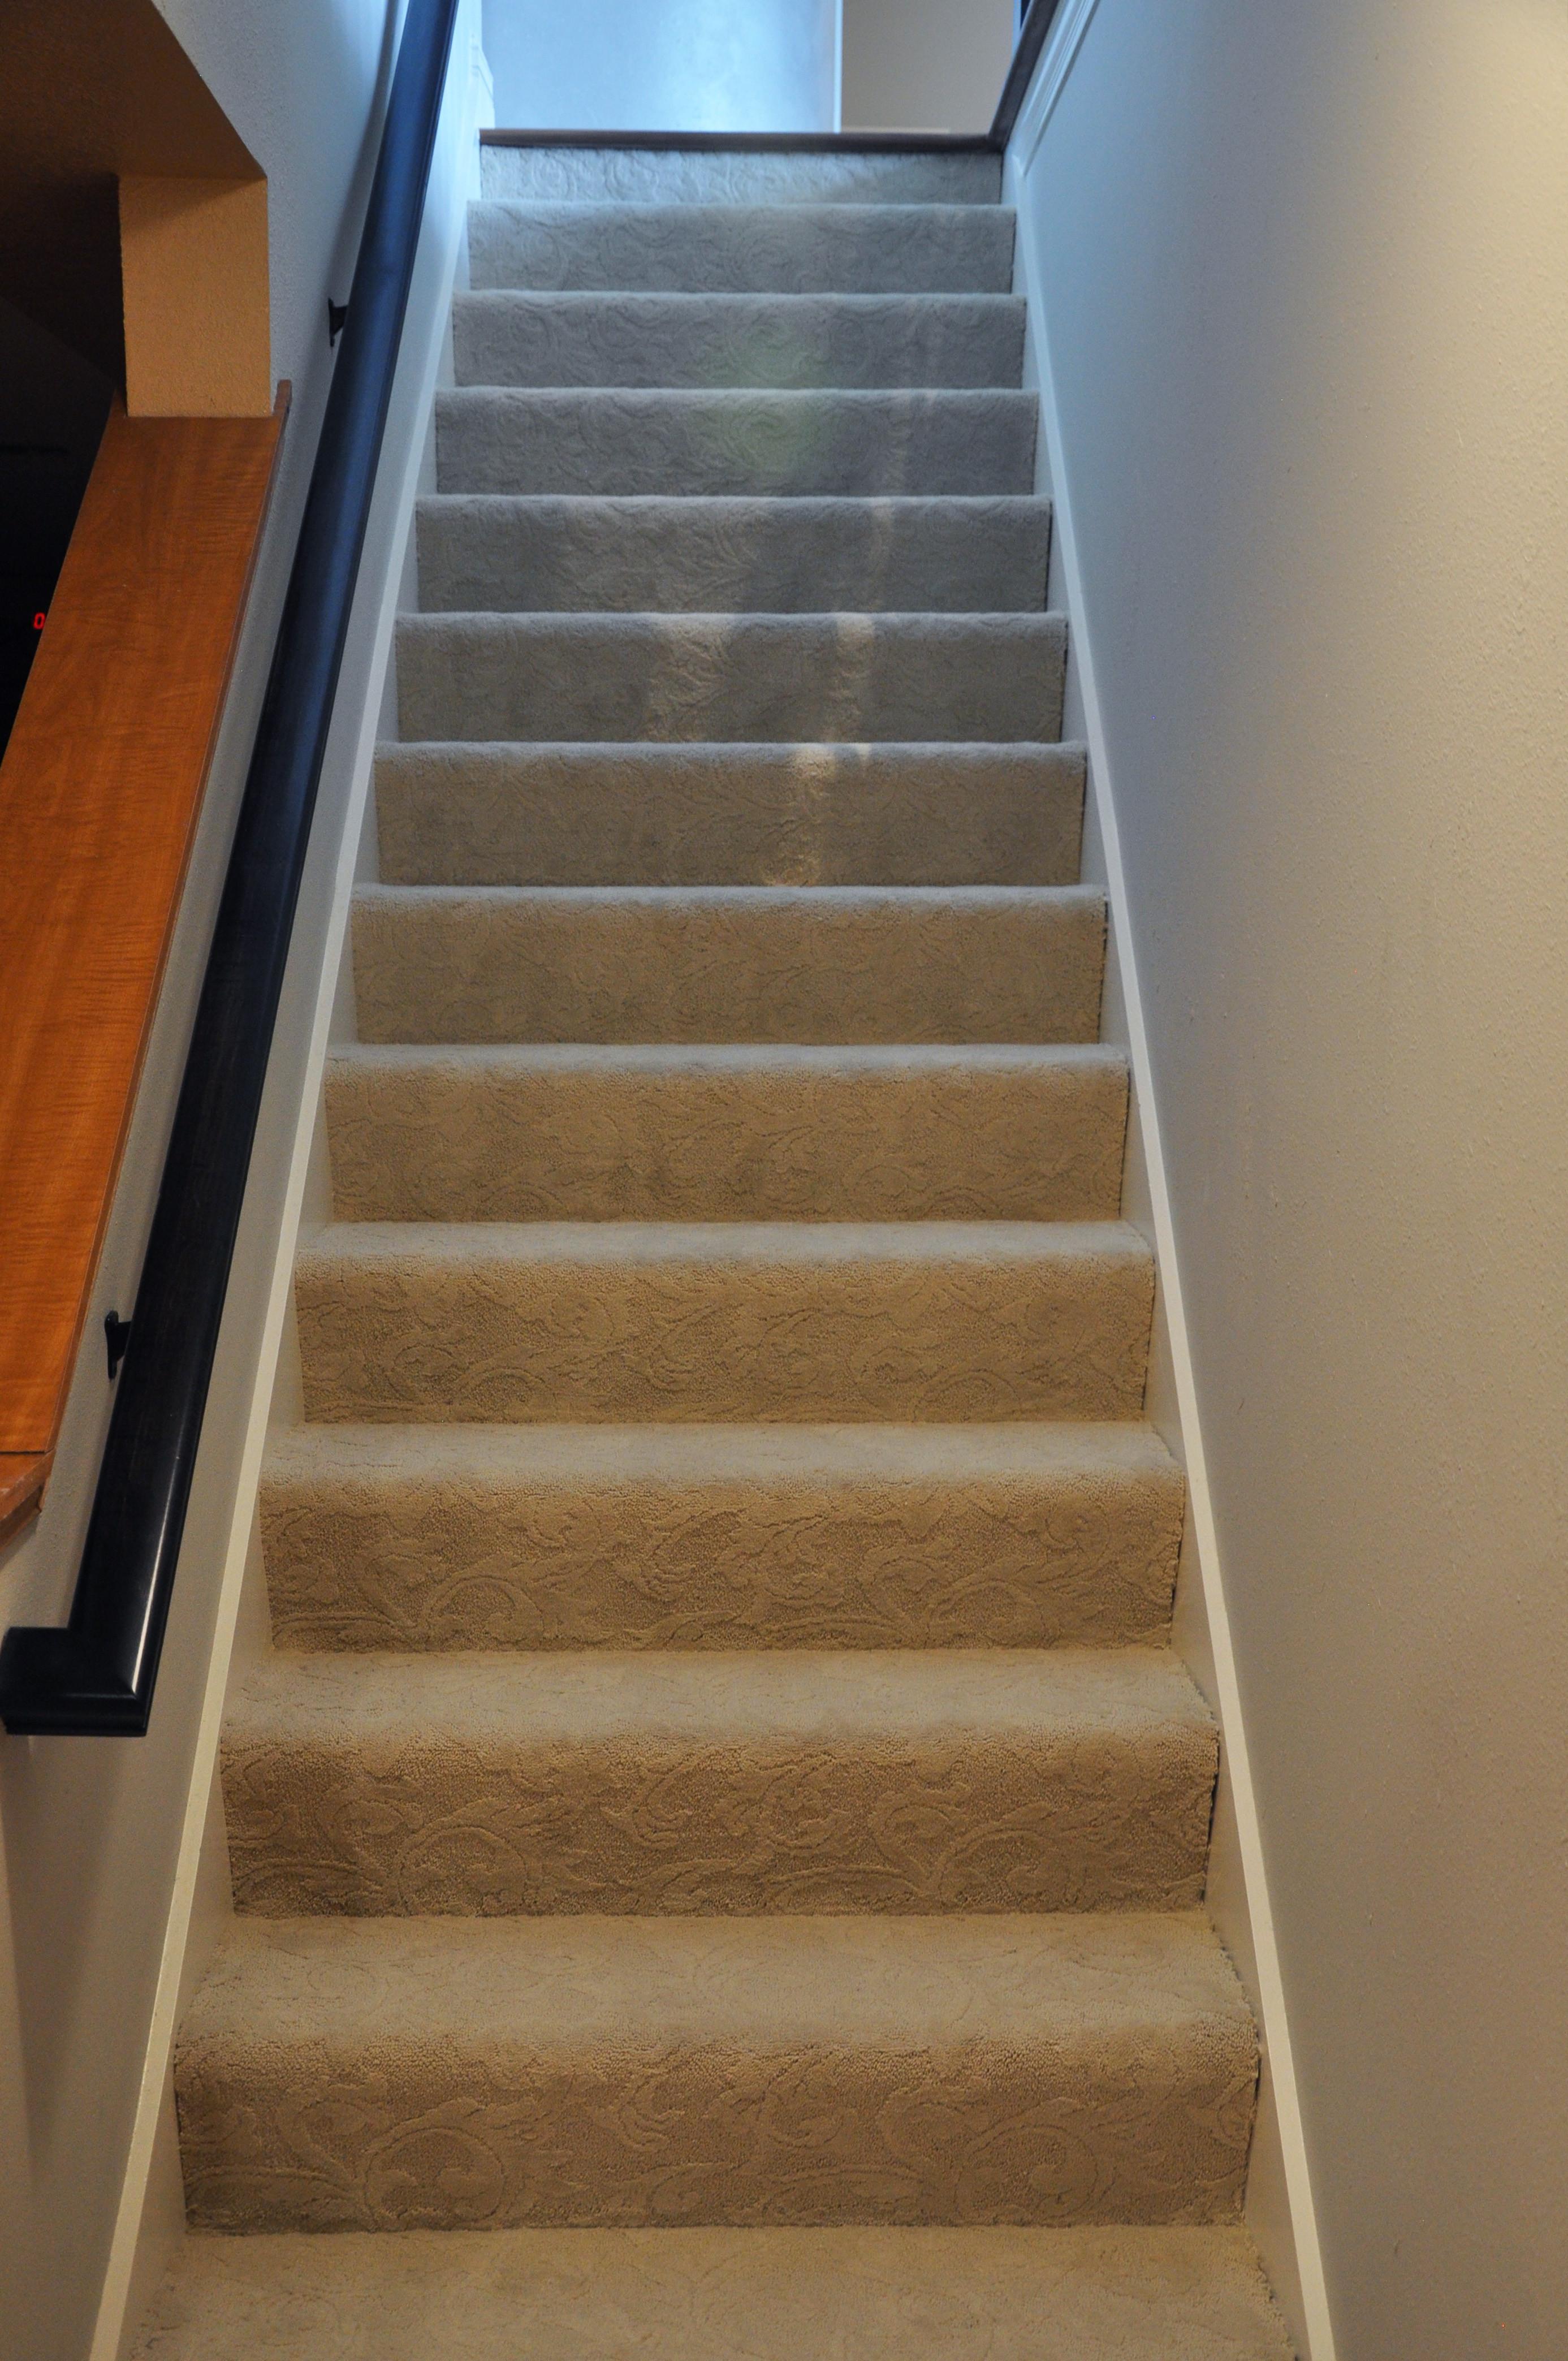 herringbone hardwood floor installation cost of hardwood stair treads staircasing installation milwaukee wi within click image to enlarge